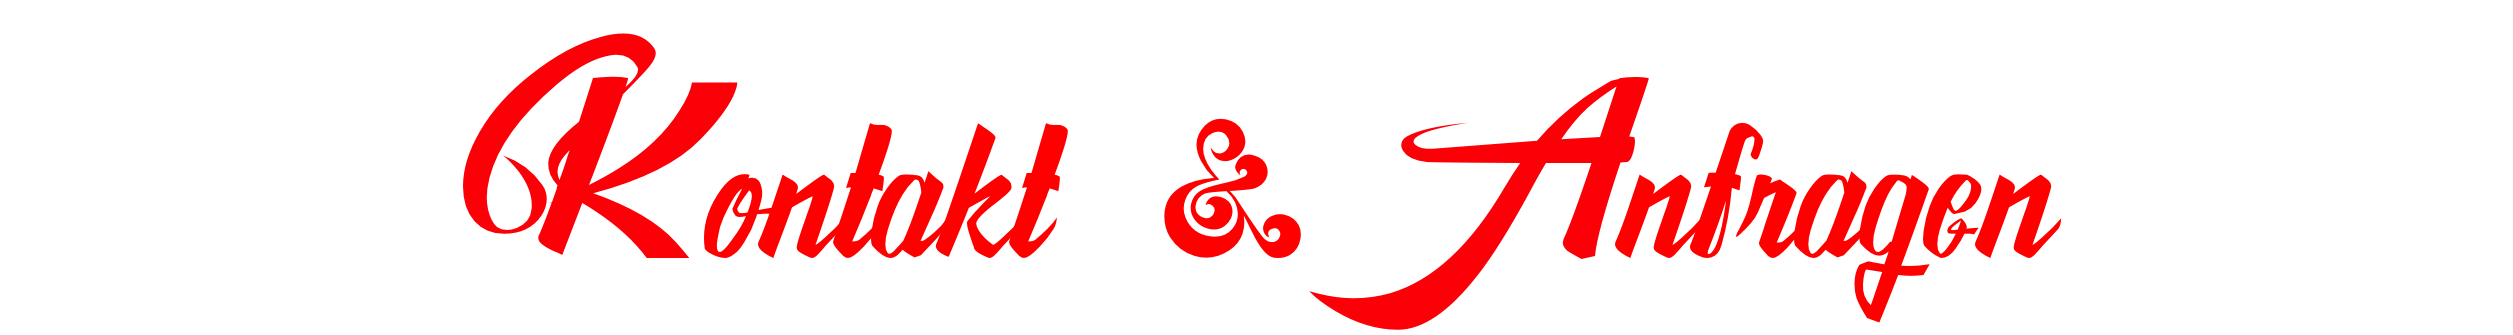 anfragen-kontakt-airwitch-custom-painting